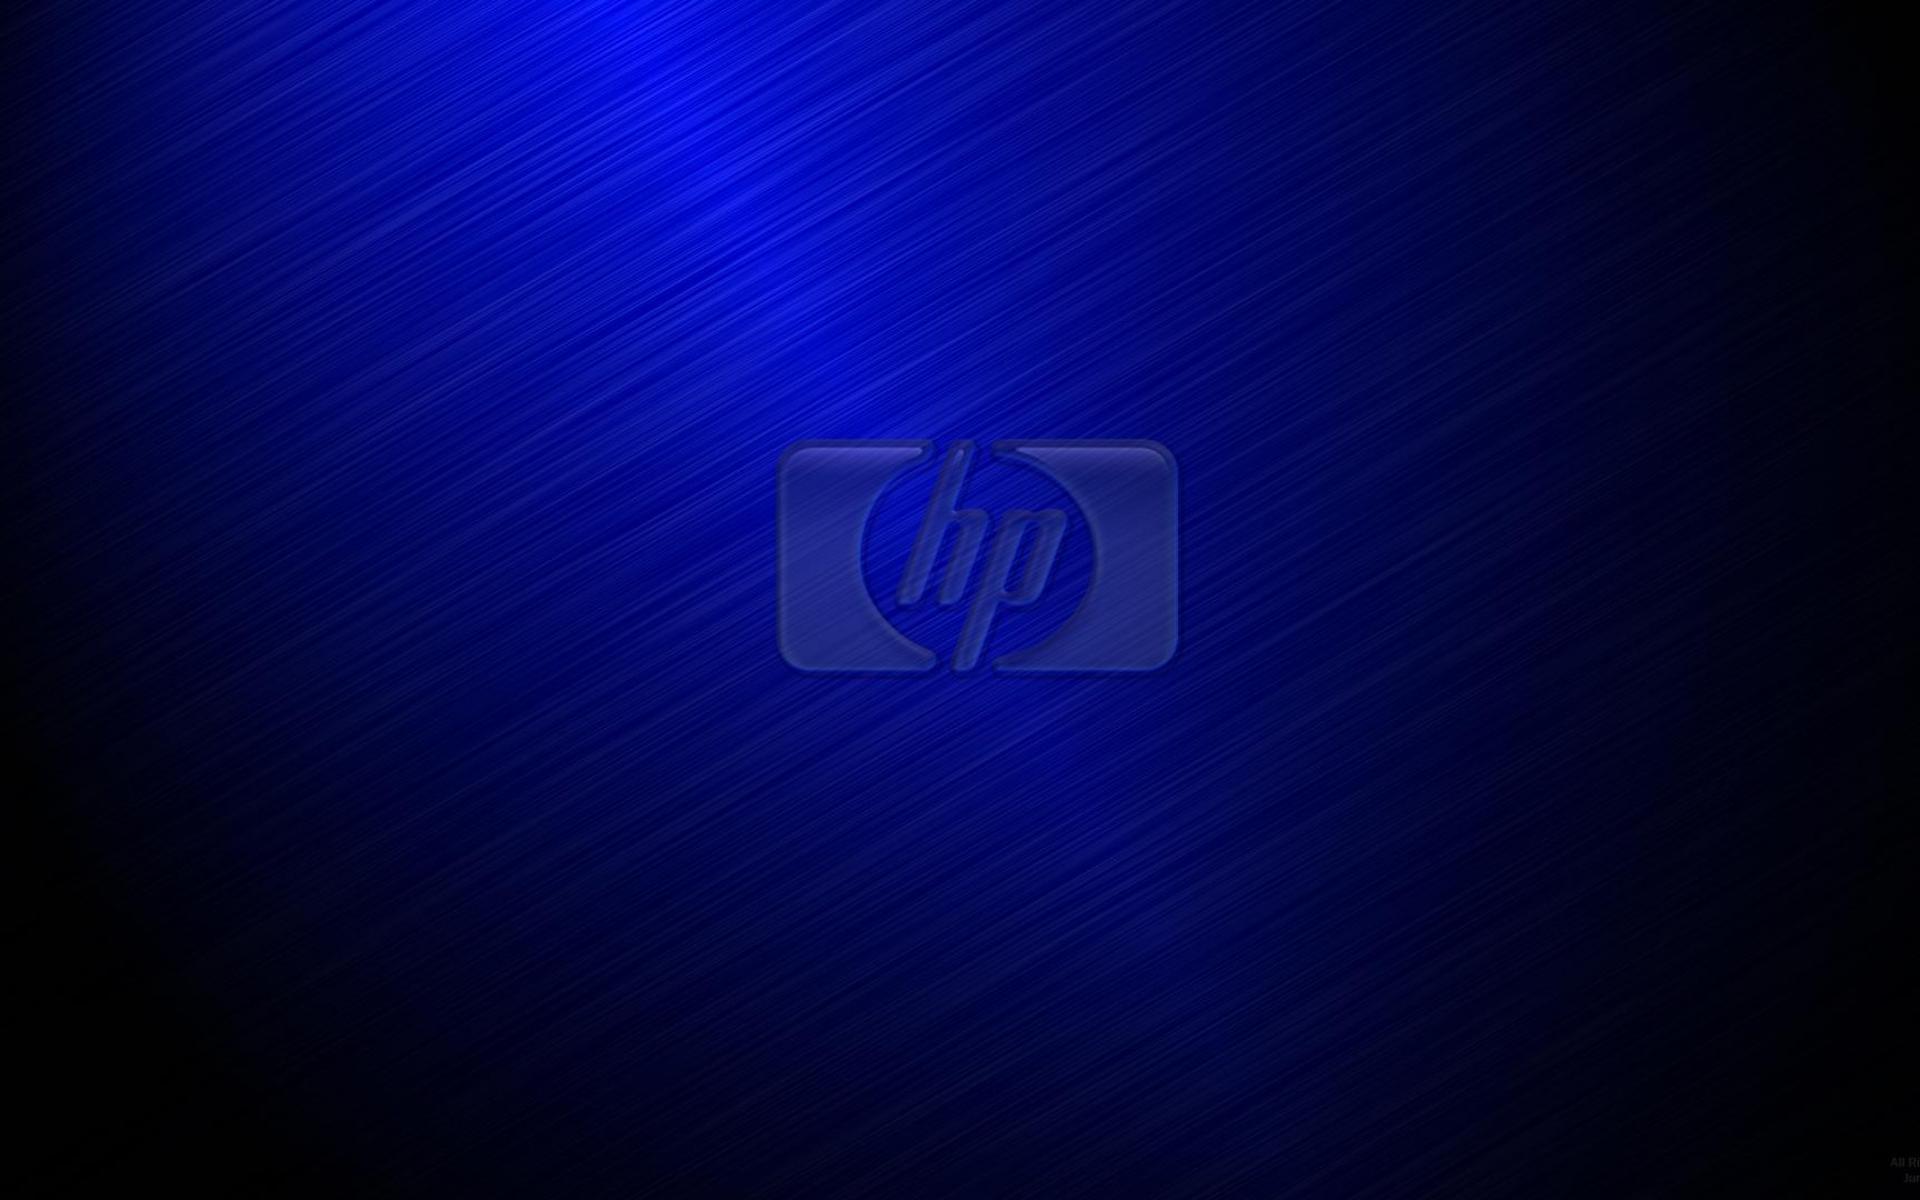 Widescreen resolutions 1610 1280x800 1440x900 1680x1050 1920x1200 1920x1200